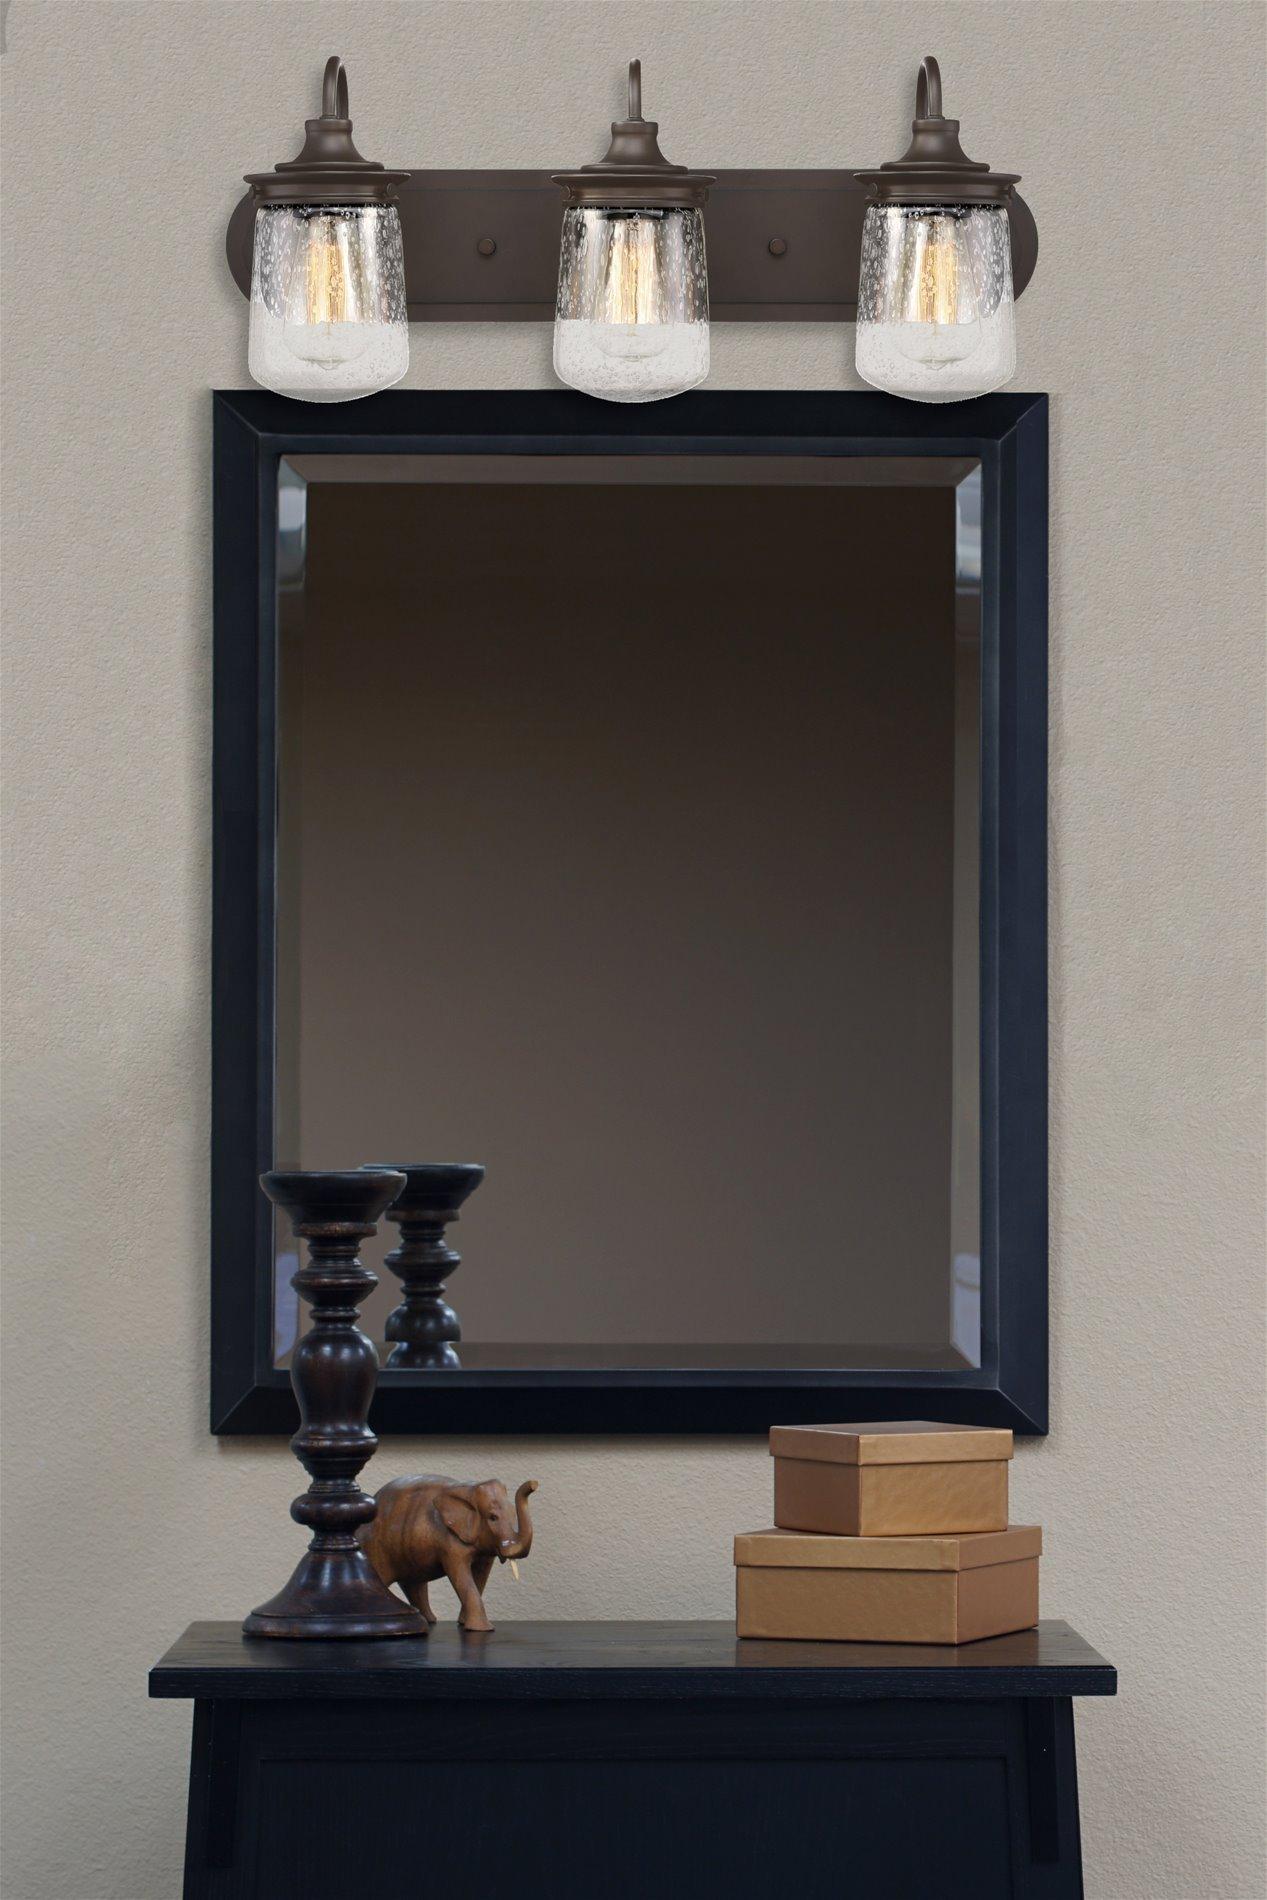 Kira Home Mason 23'' 3-Light Industrial Vanity/Bathroom Light + Seeded Glass Shade, Oil-Rubbed Bronze Finish by Kira Home (Image #5)